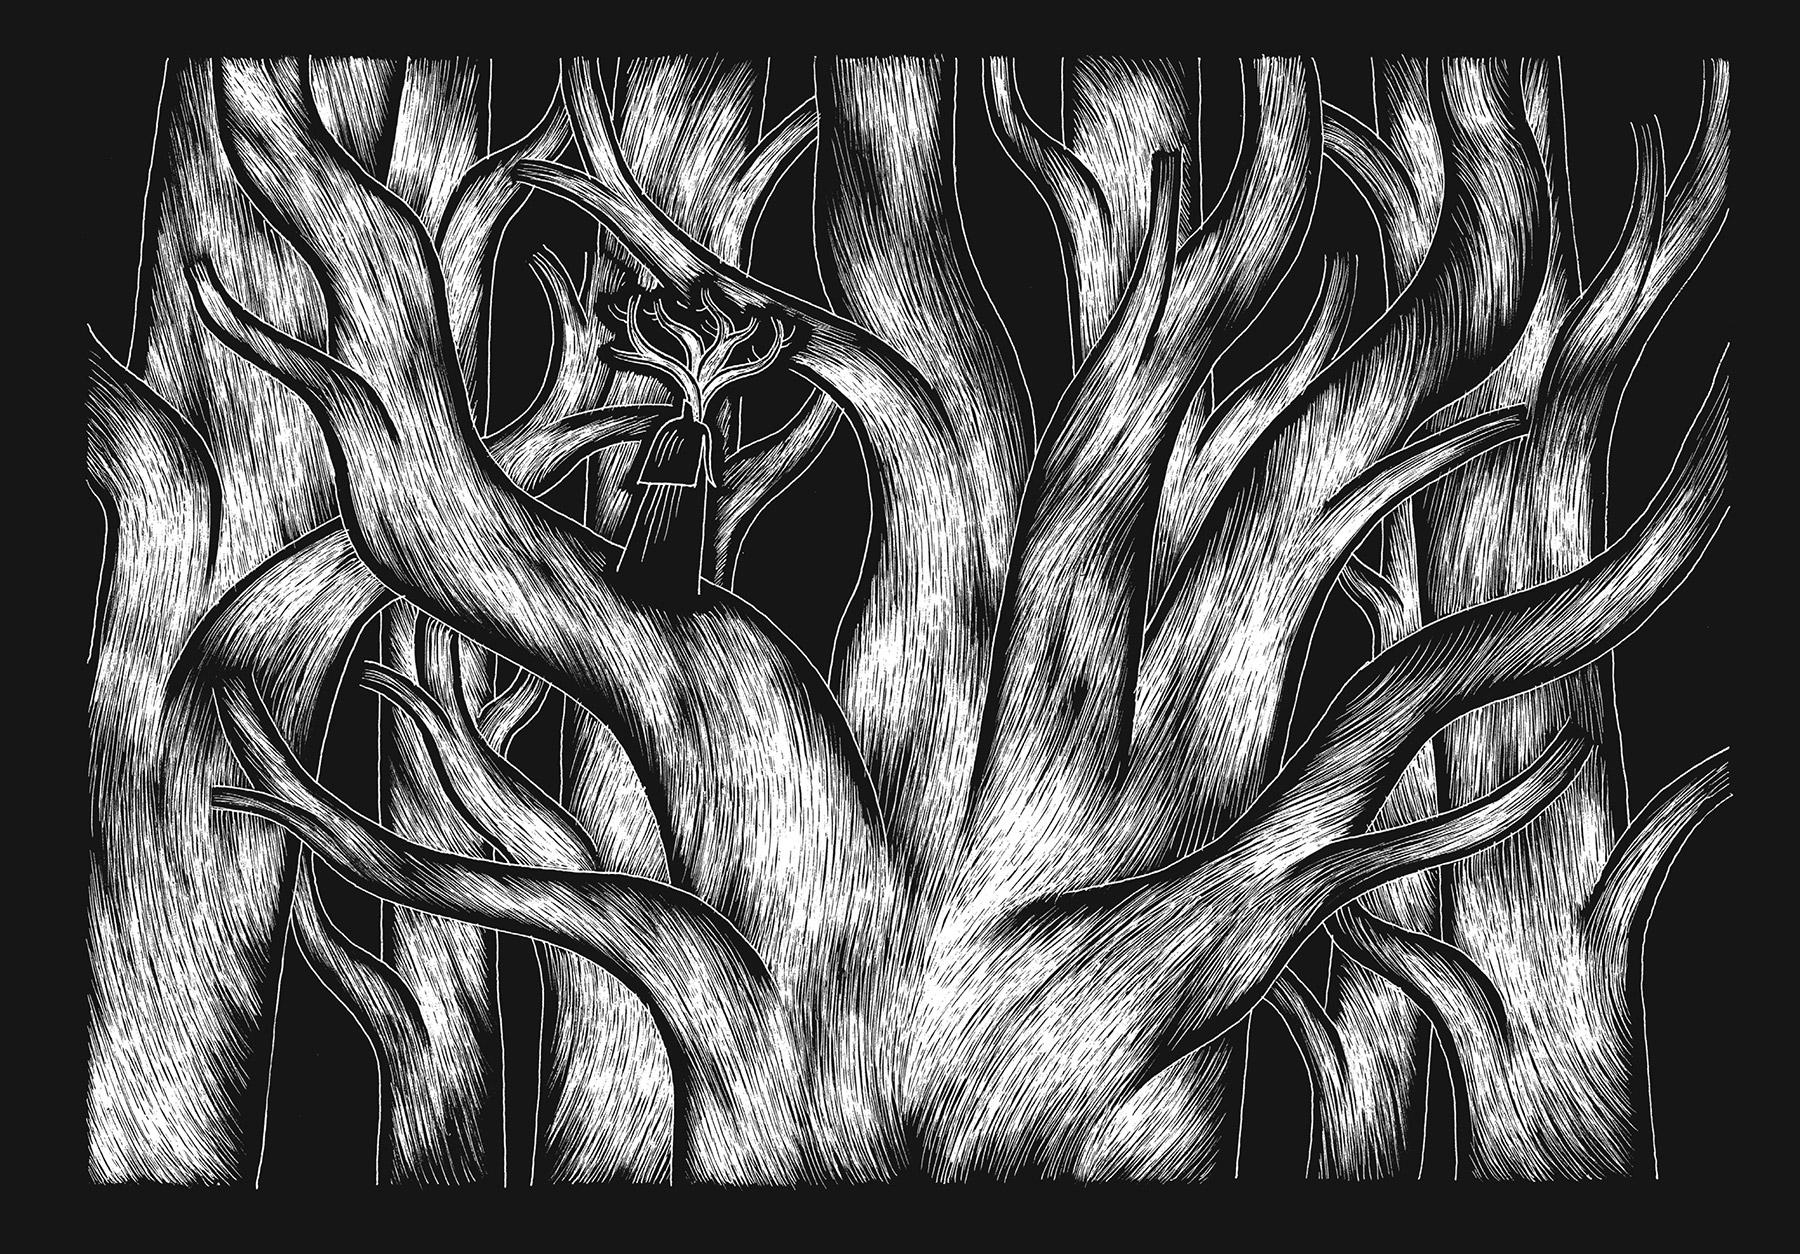 davidm-arboreal-web_expanded-8.jpg